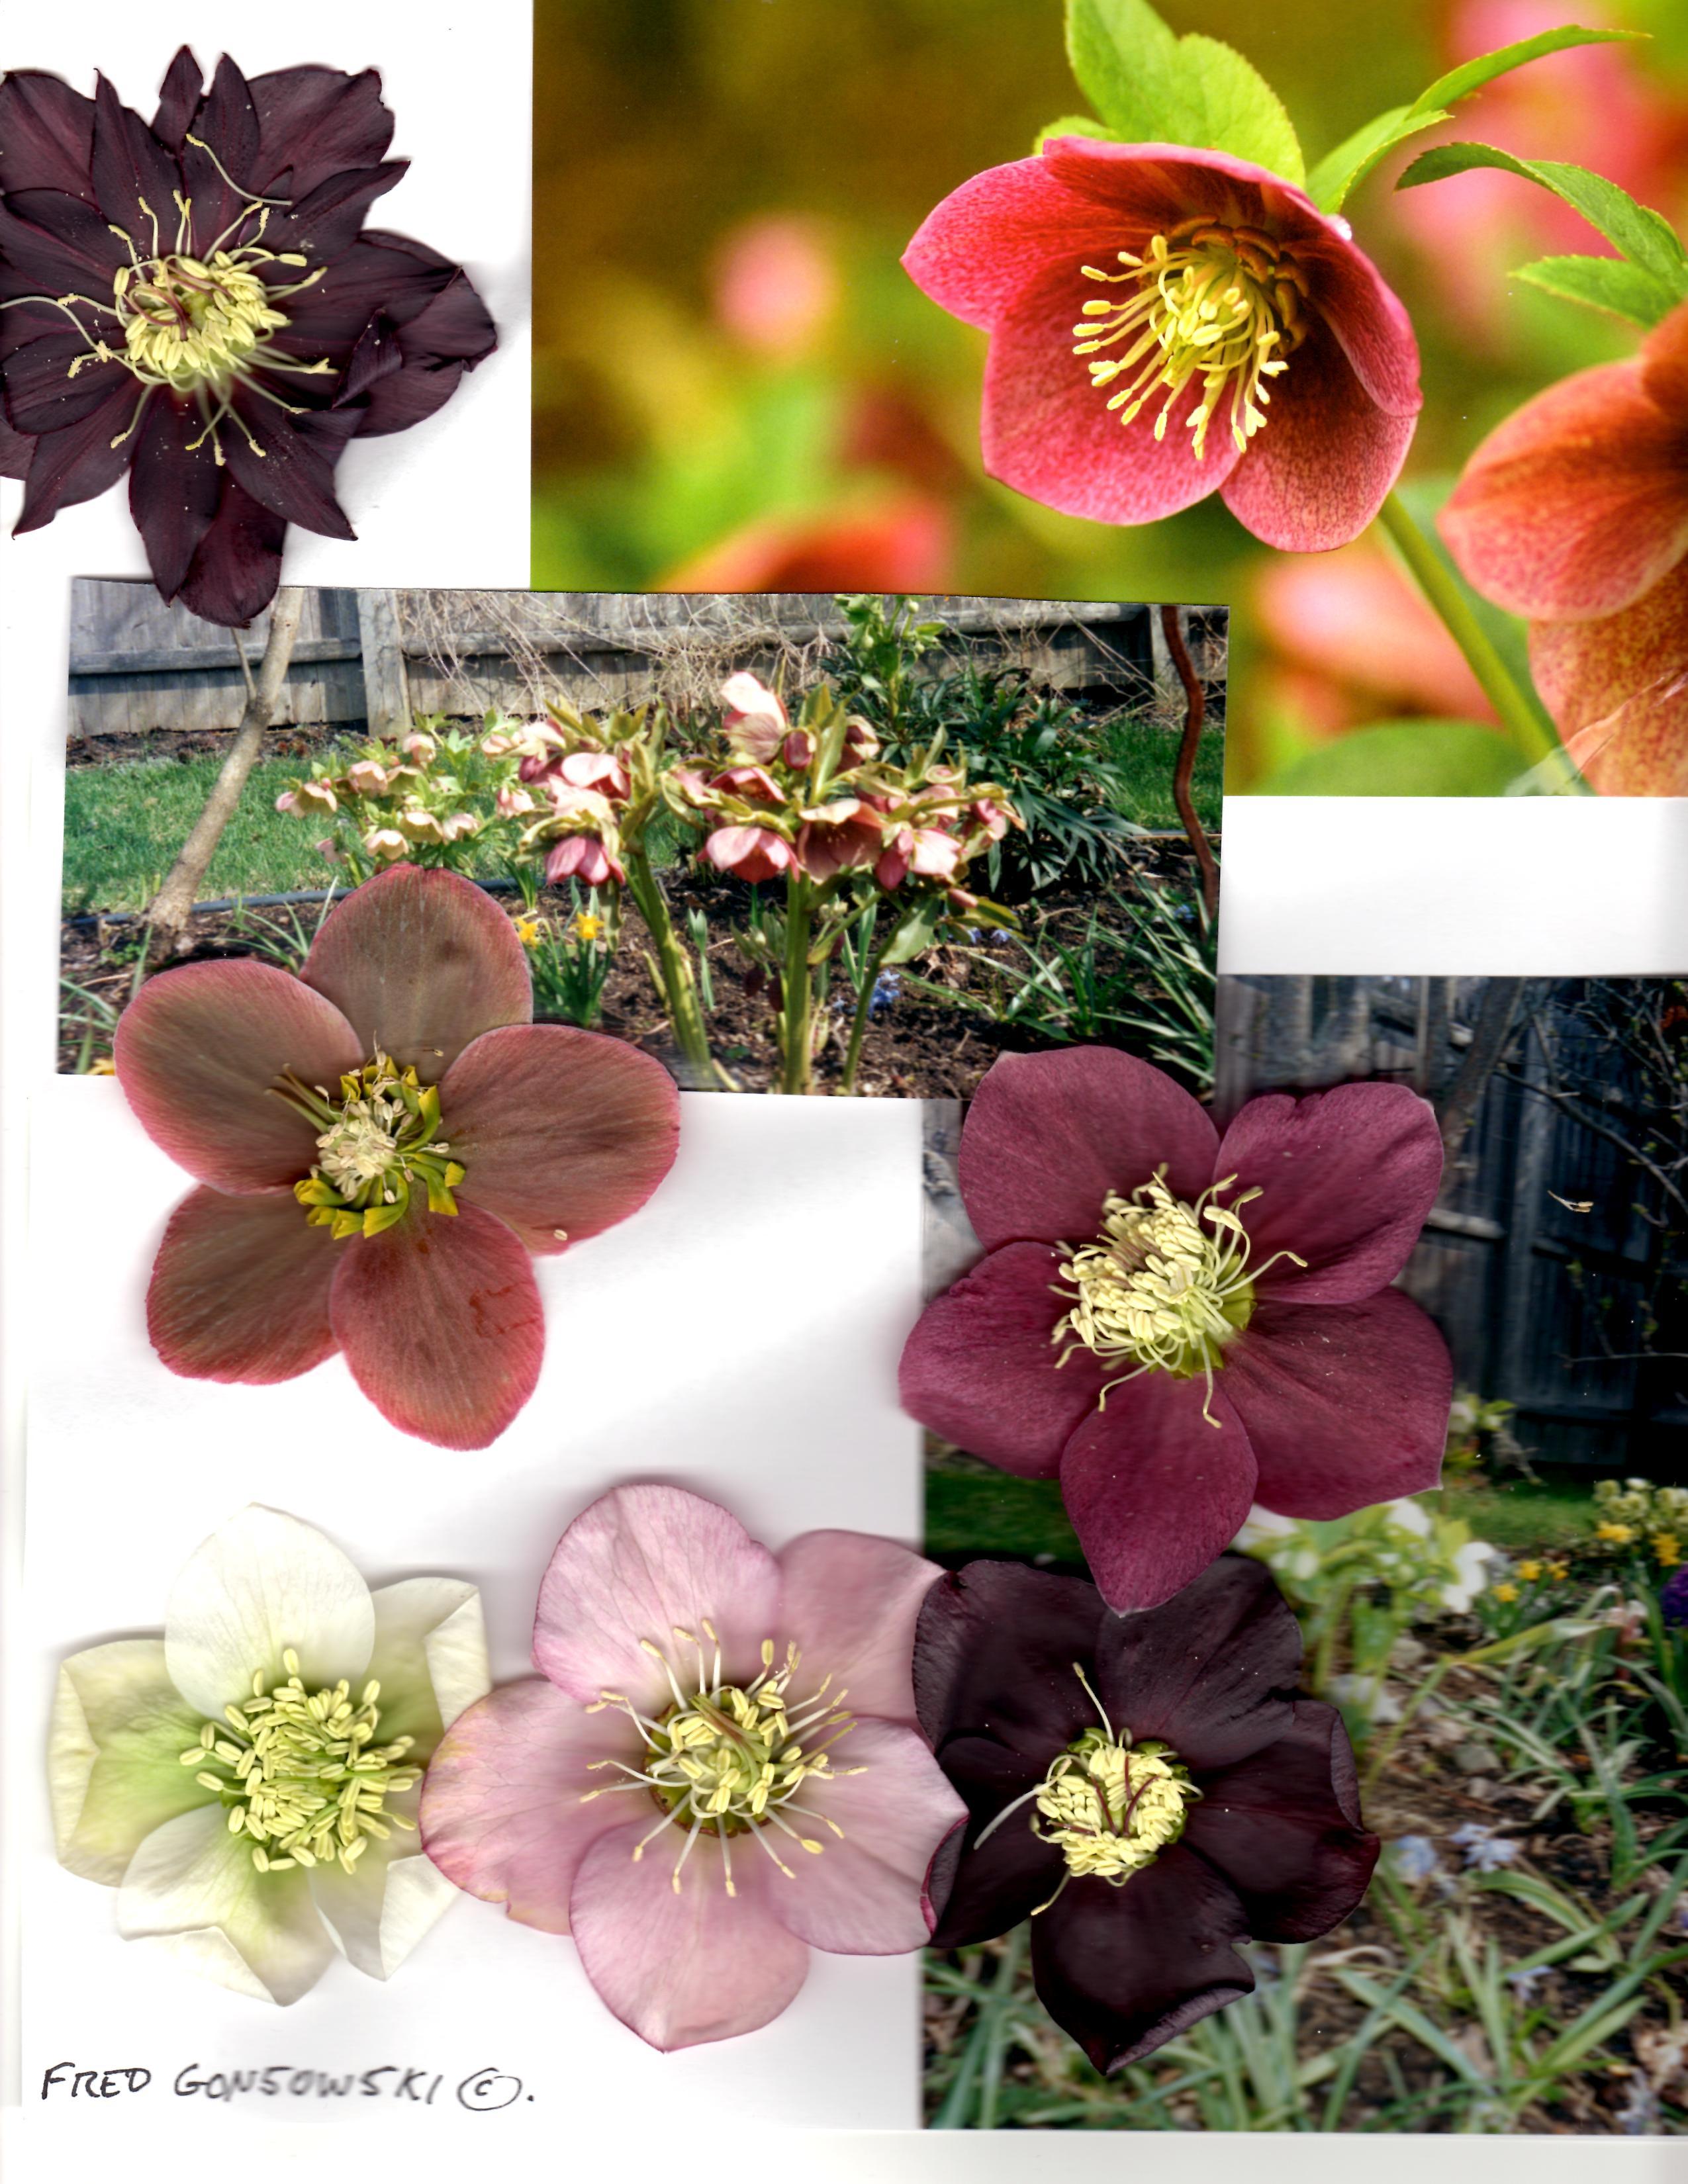 planting hellebores  lenten roses  to celebrate spring